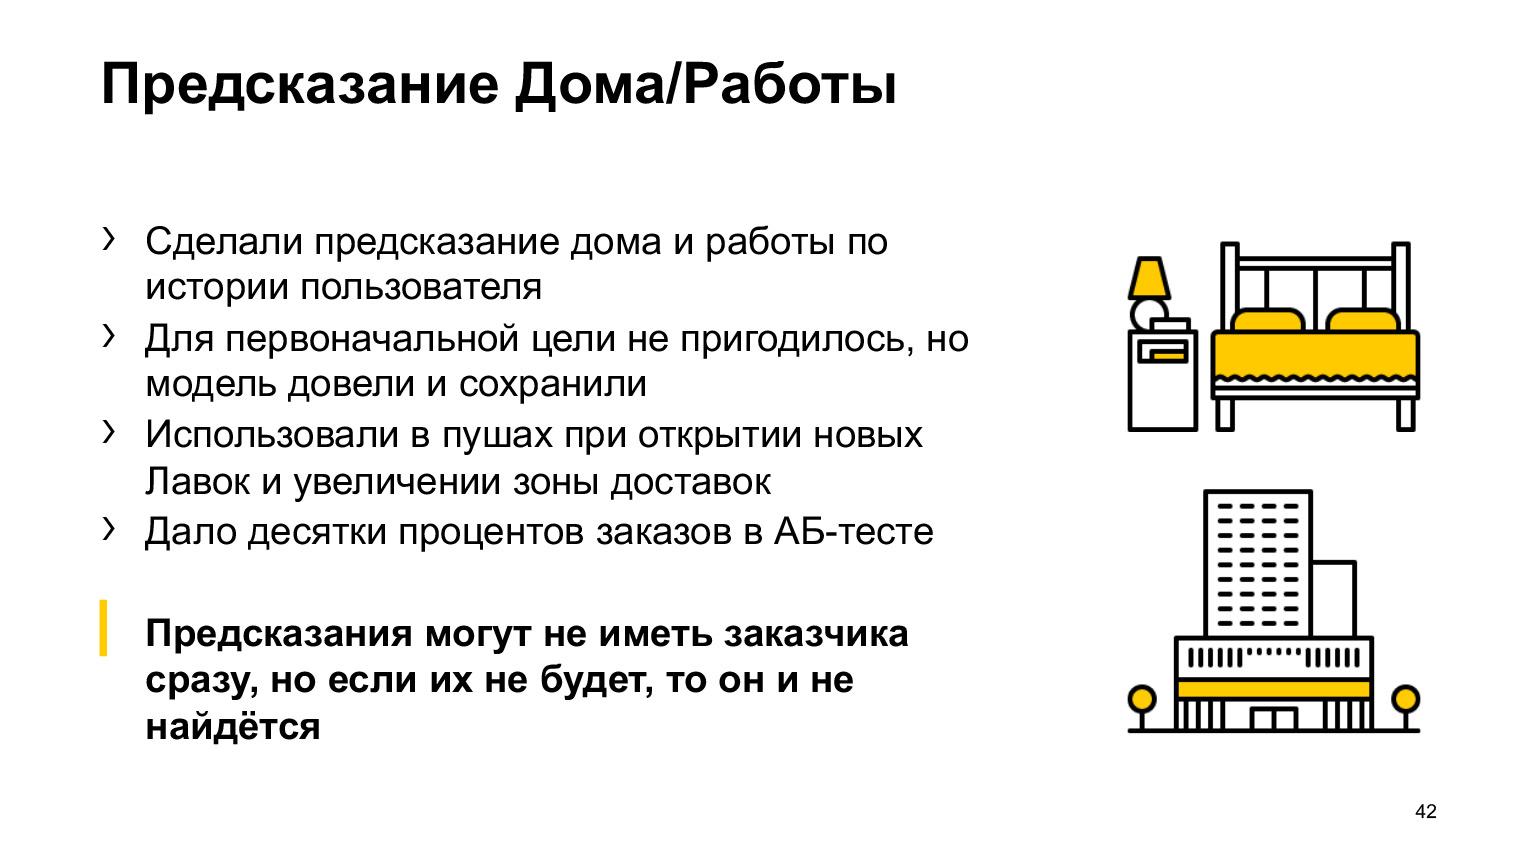 Как коронавирус повлиял на ML-проекты Такси, Еды и Лавки. Доклад Яндекса - 15